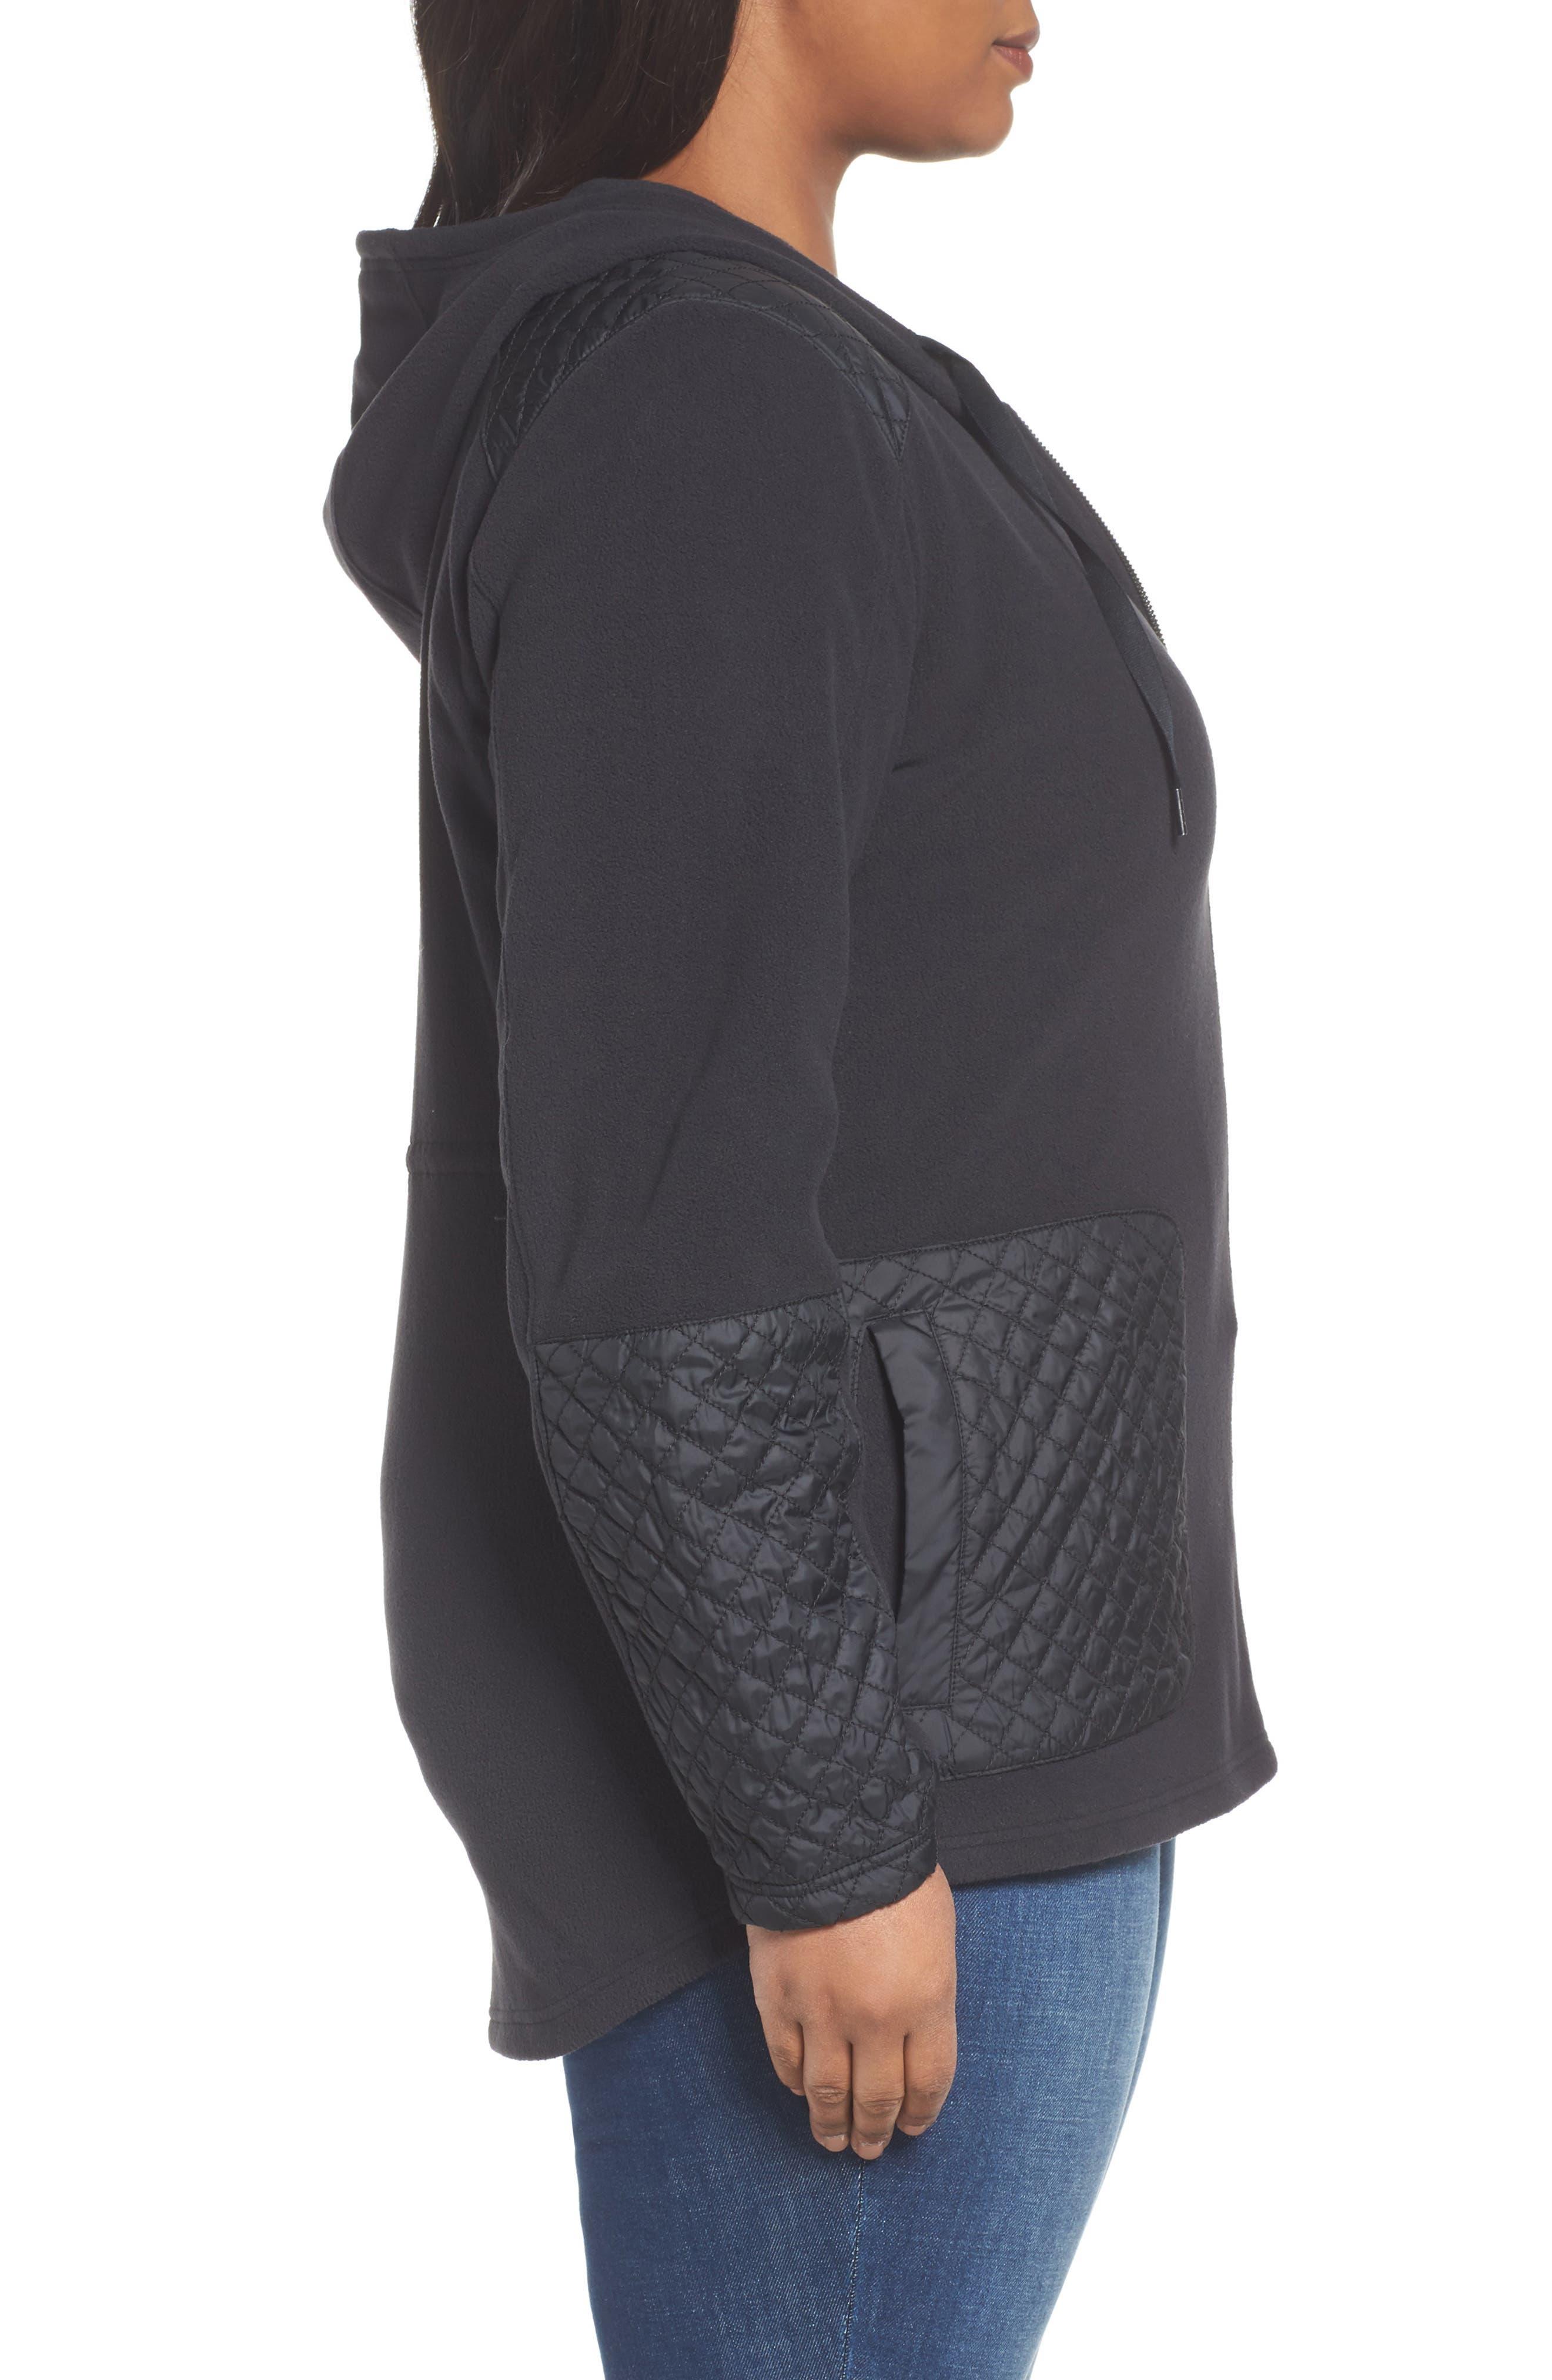 Warm Up Hooded Fleece Jacket,                             Alternate thumbnail 3, color,                             010